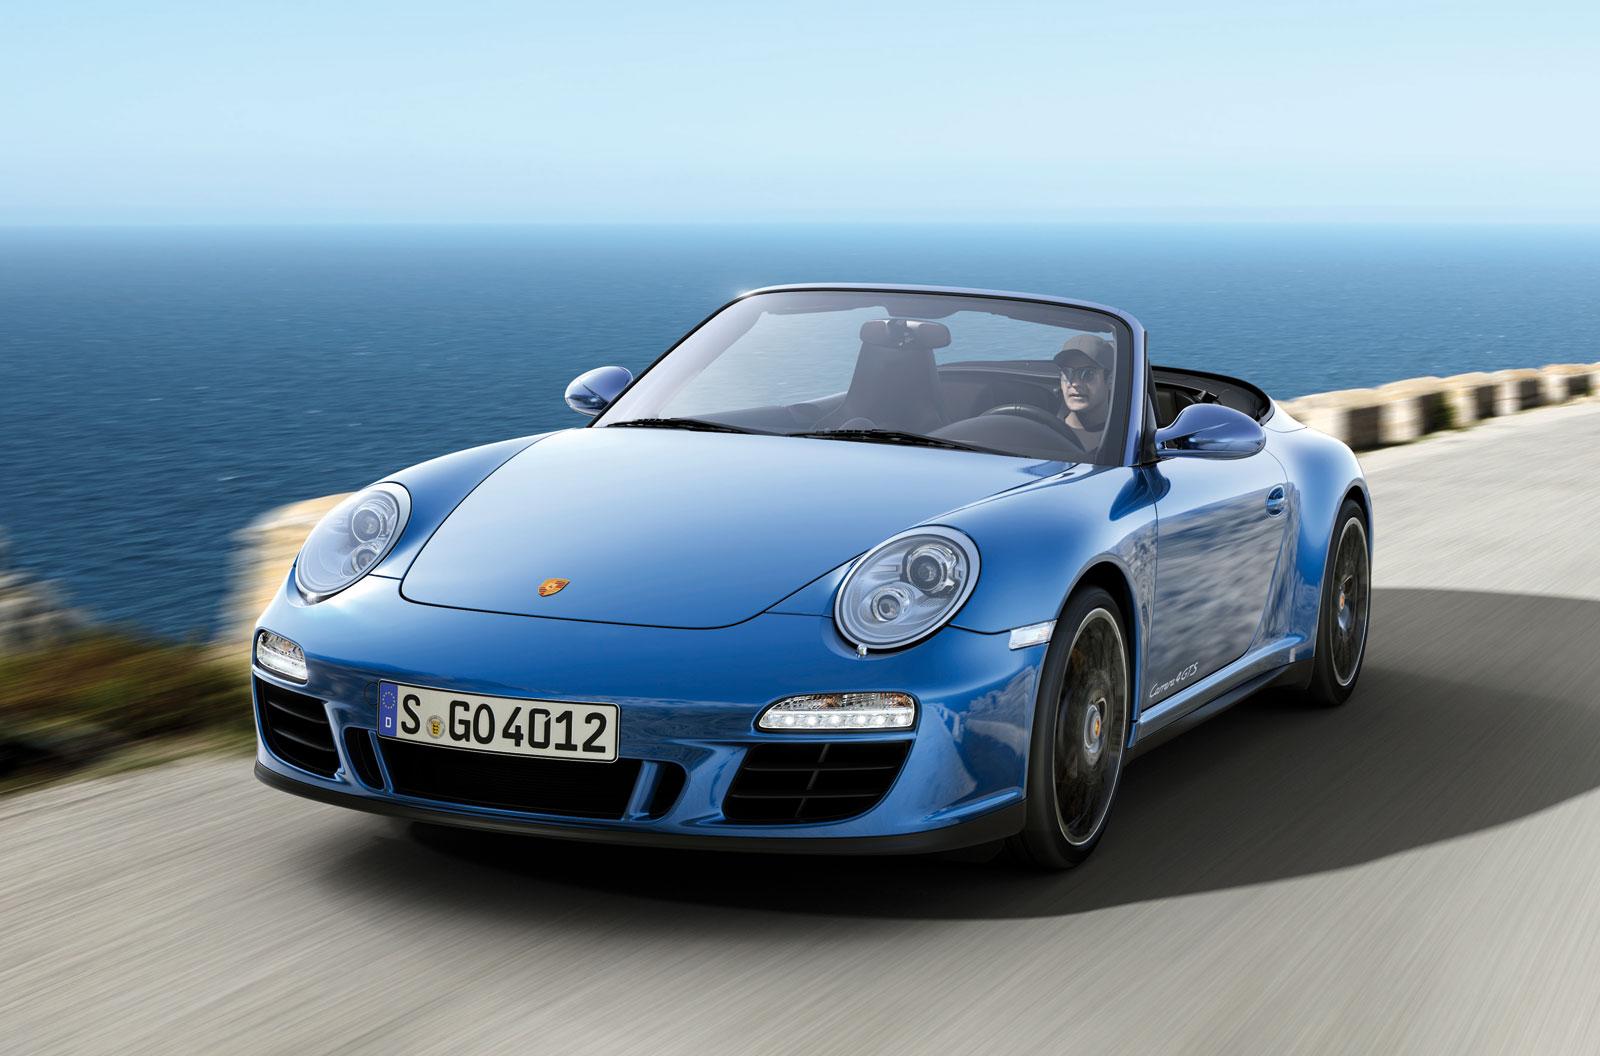 Porsche911Carrera4GTSCabrioletHdWallpapers2012jpg 1600x1056